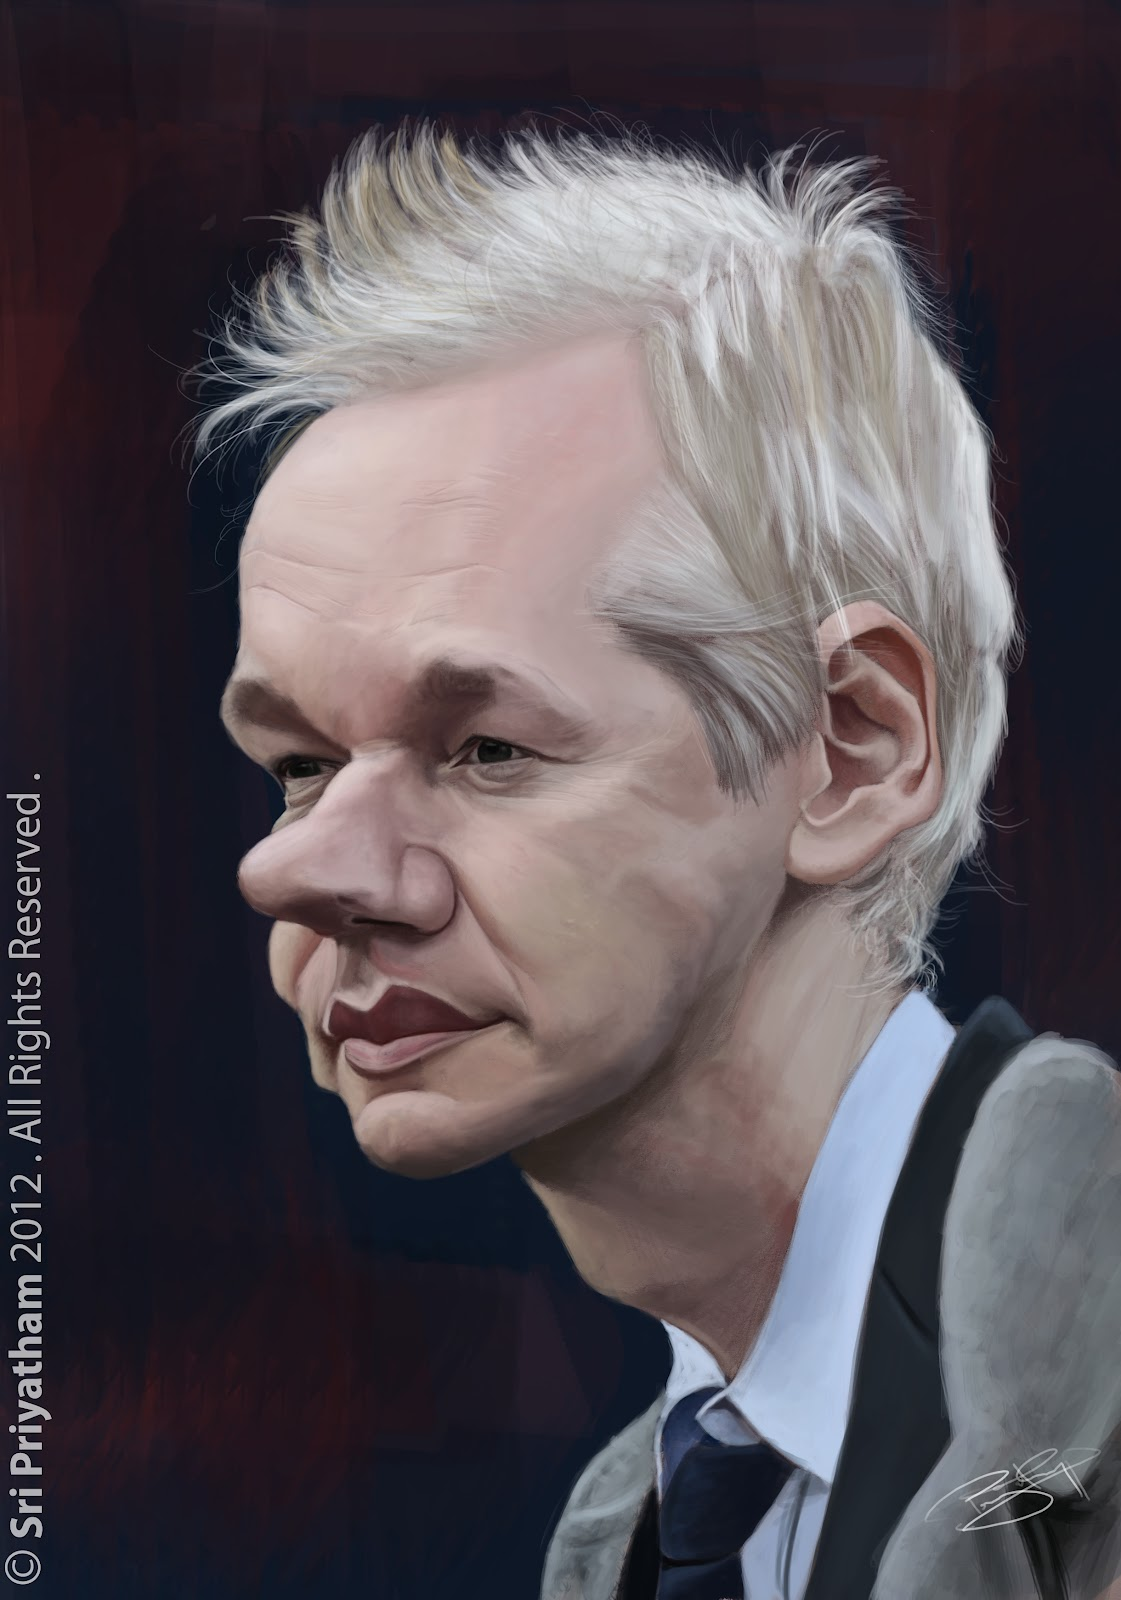 http://1.bp.blogspot.com/-qFfwd3iIuss/UFVMAj1XQFI/AAAAAAAAAHo/f_FROfqqAls/s1600/Julian+Assange.jpg